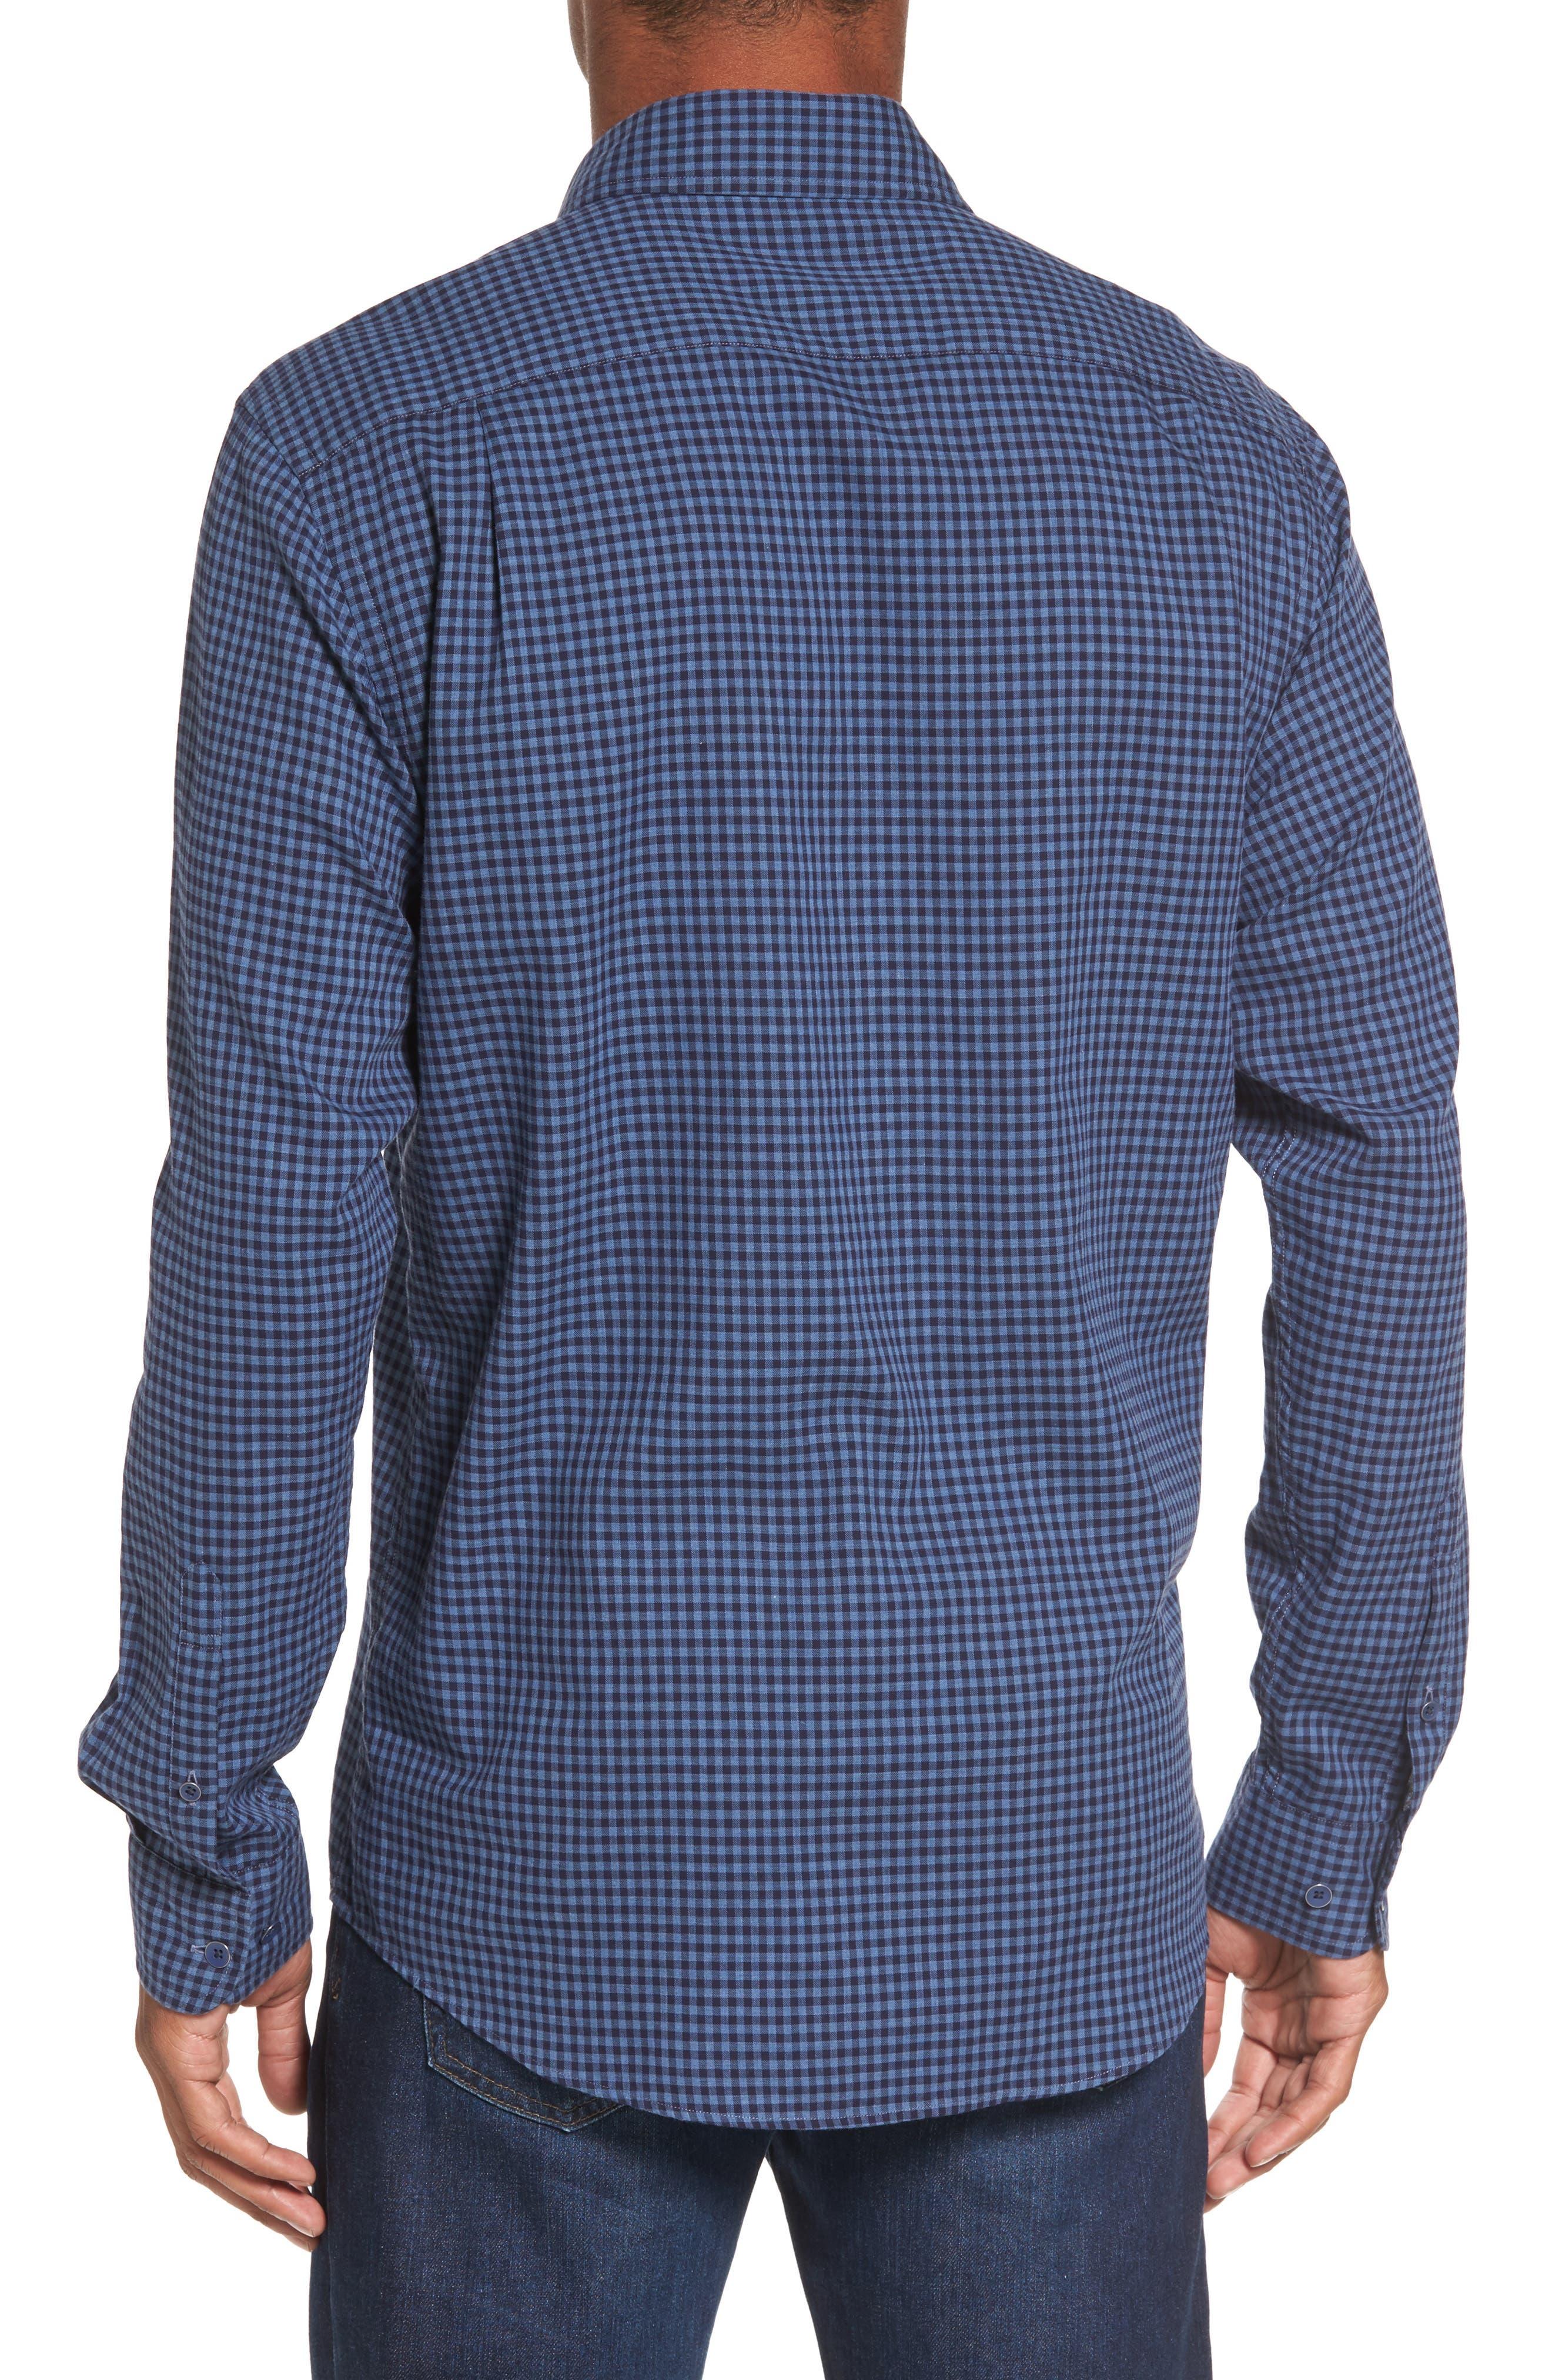 Alternate Image 2  - Rodd & Gunn Kennington Regular Fit Gingham Sport Shirt